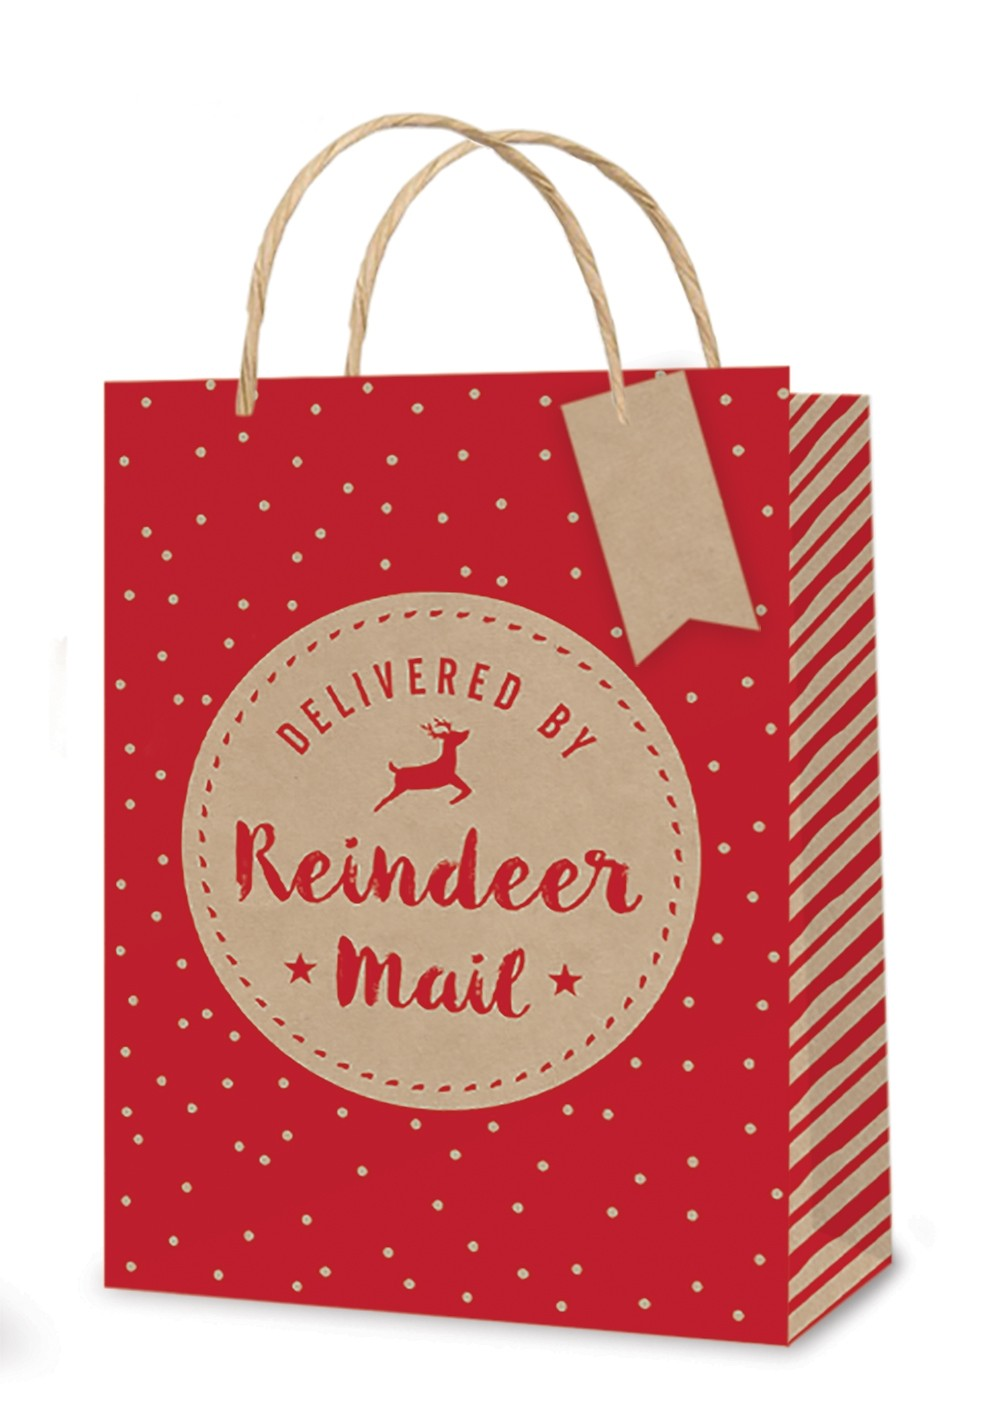 Kraft reindeer mail large gift bag